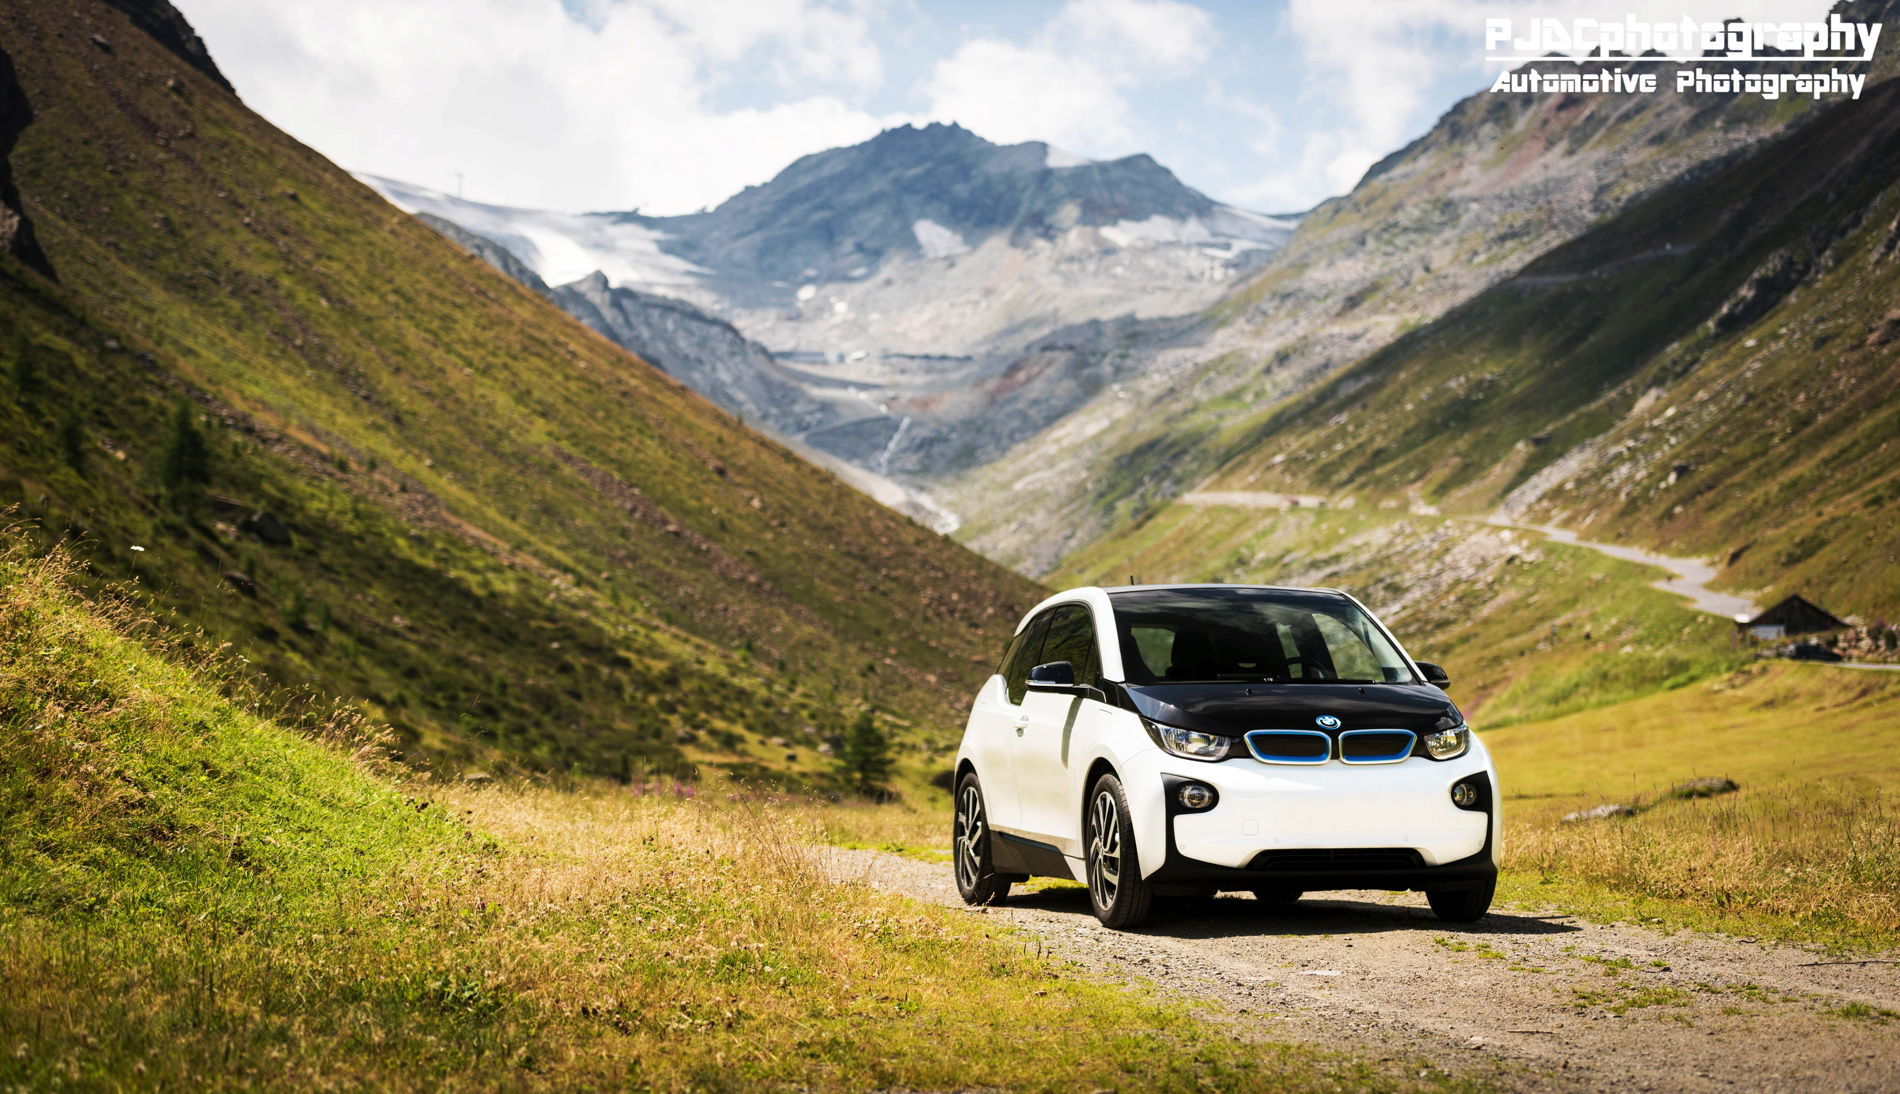 BMW i3 photoshoot alps images 1900x1200 02